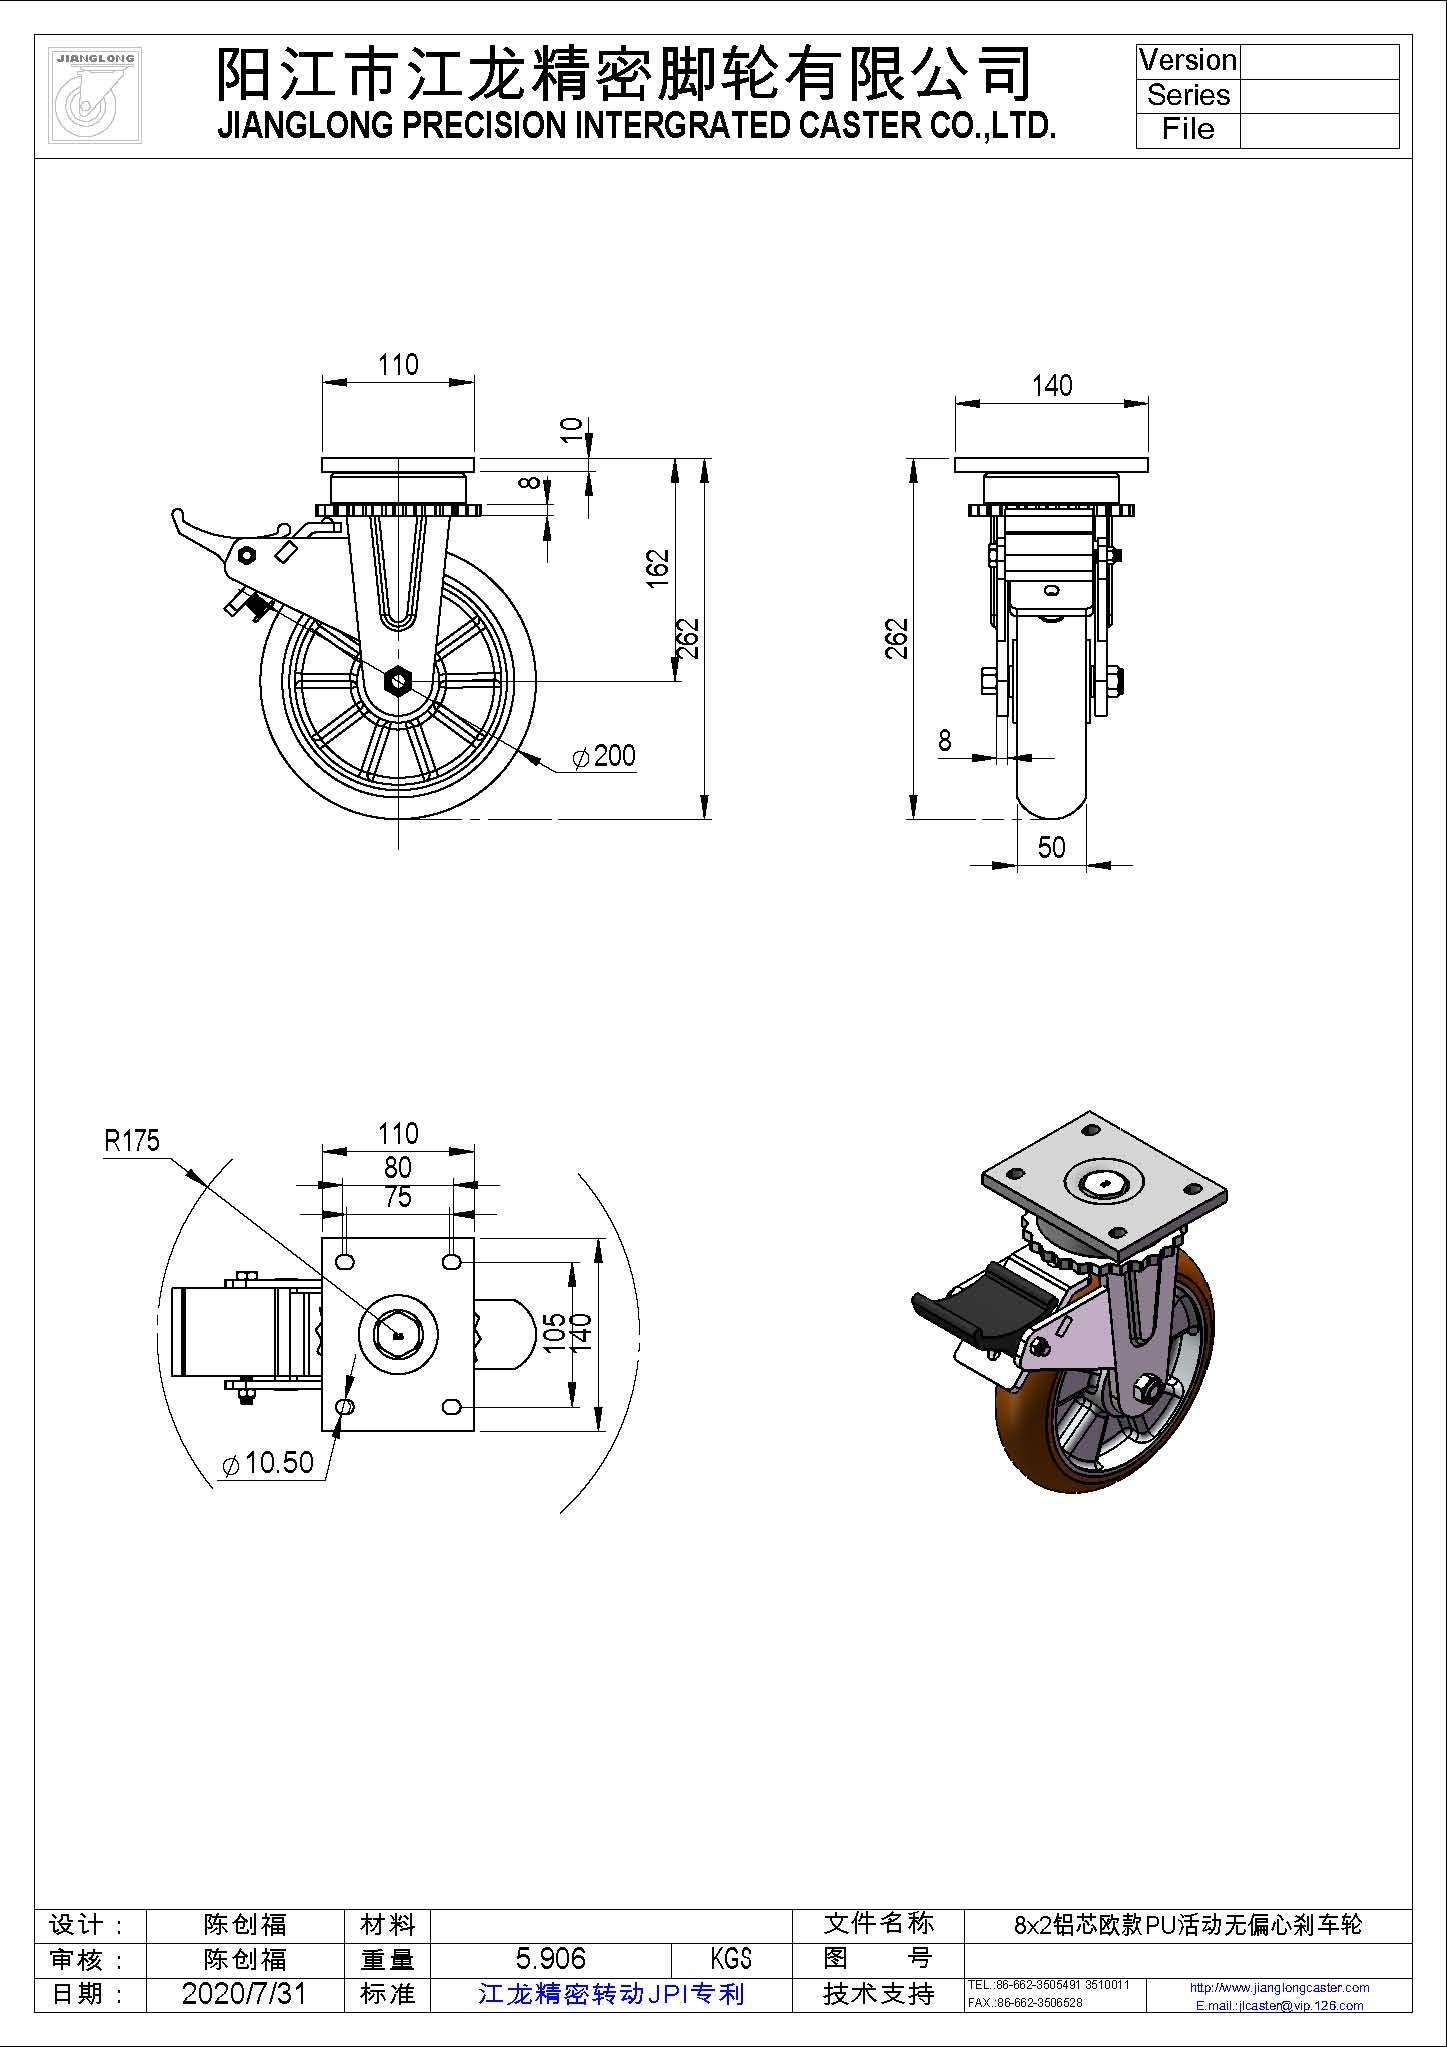 8x2鋁芯歐款PU活動無偏心剎車輪圖紙.jpg